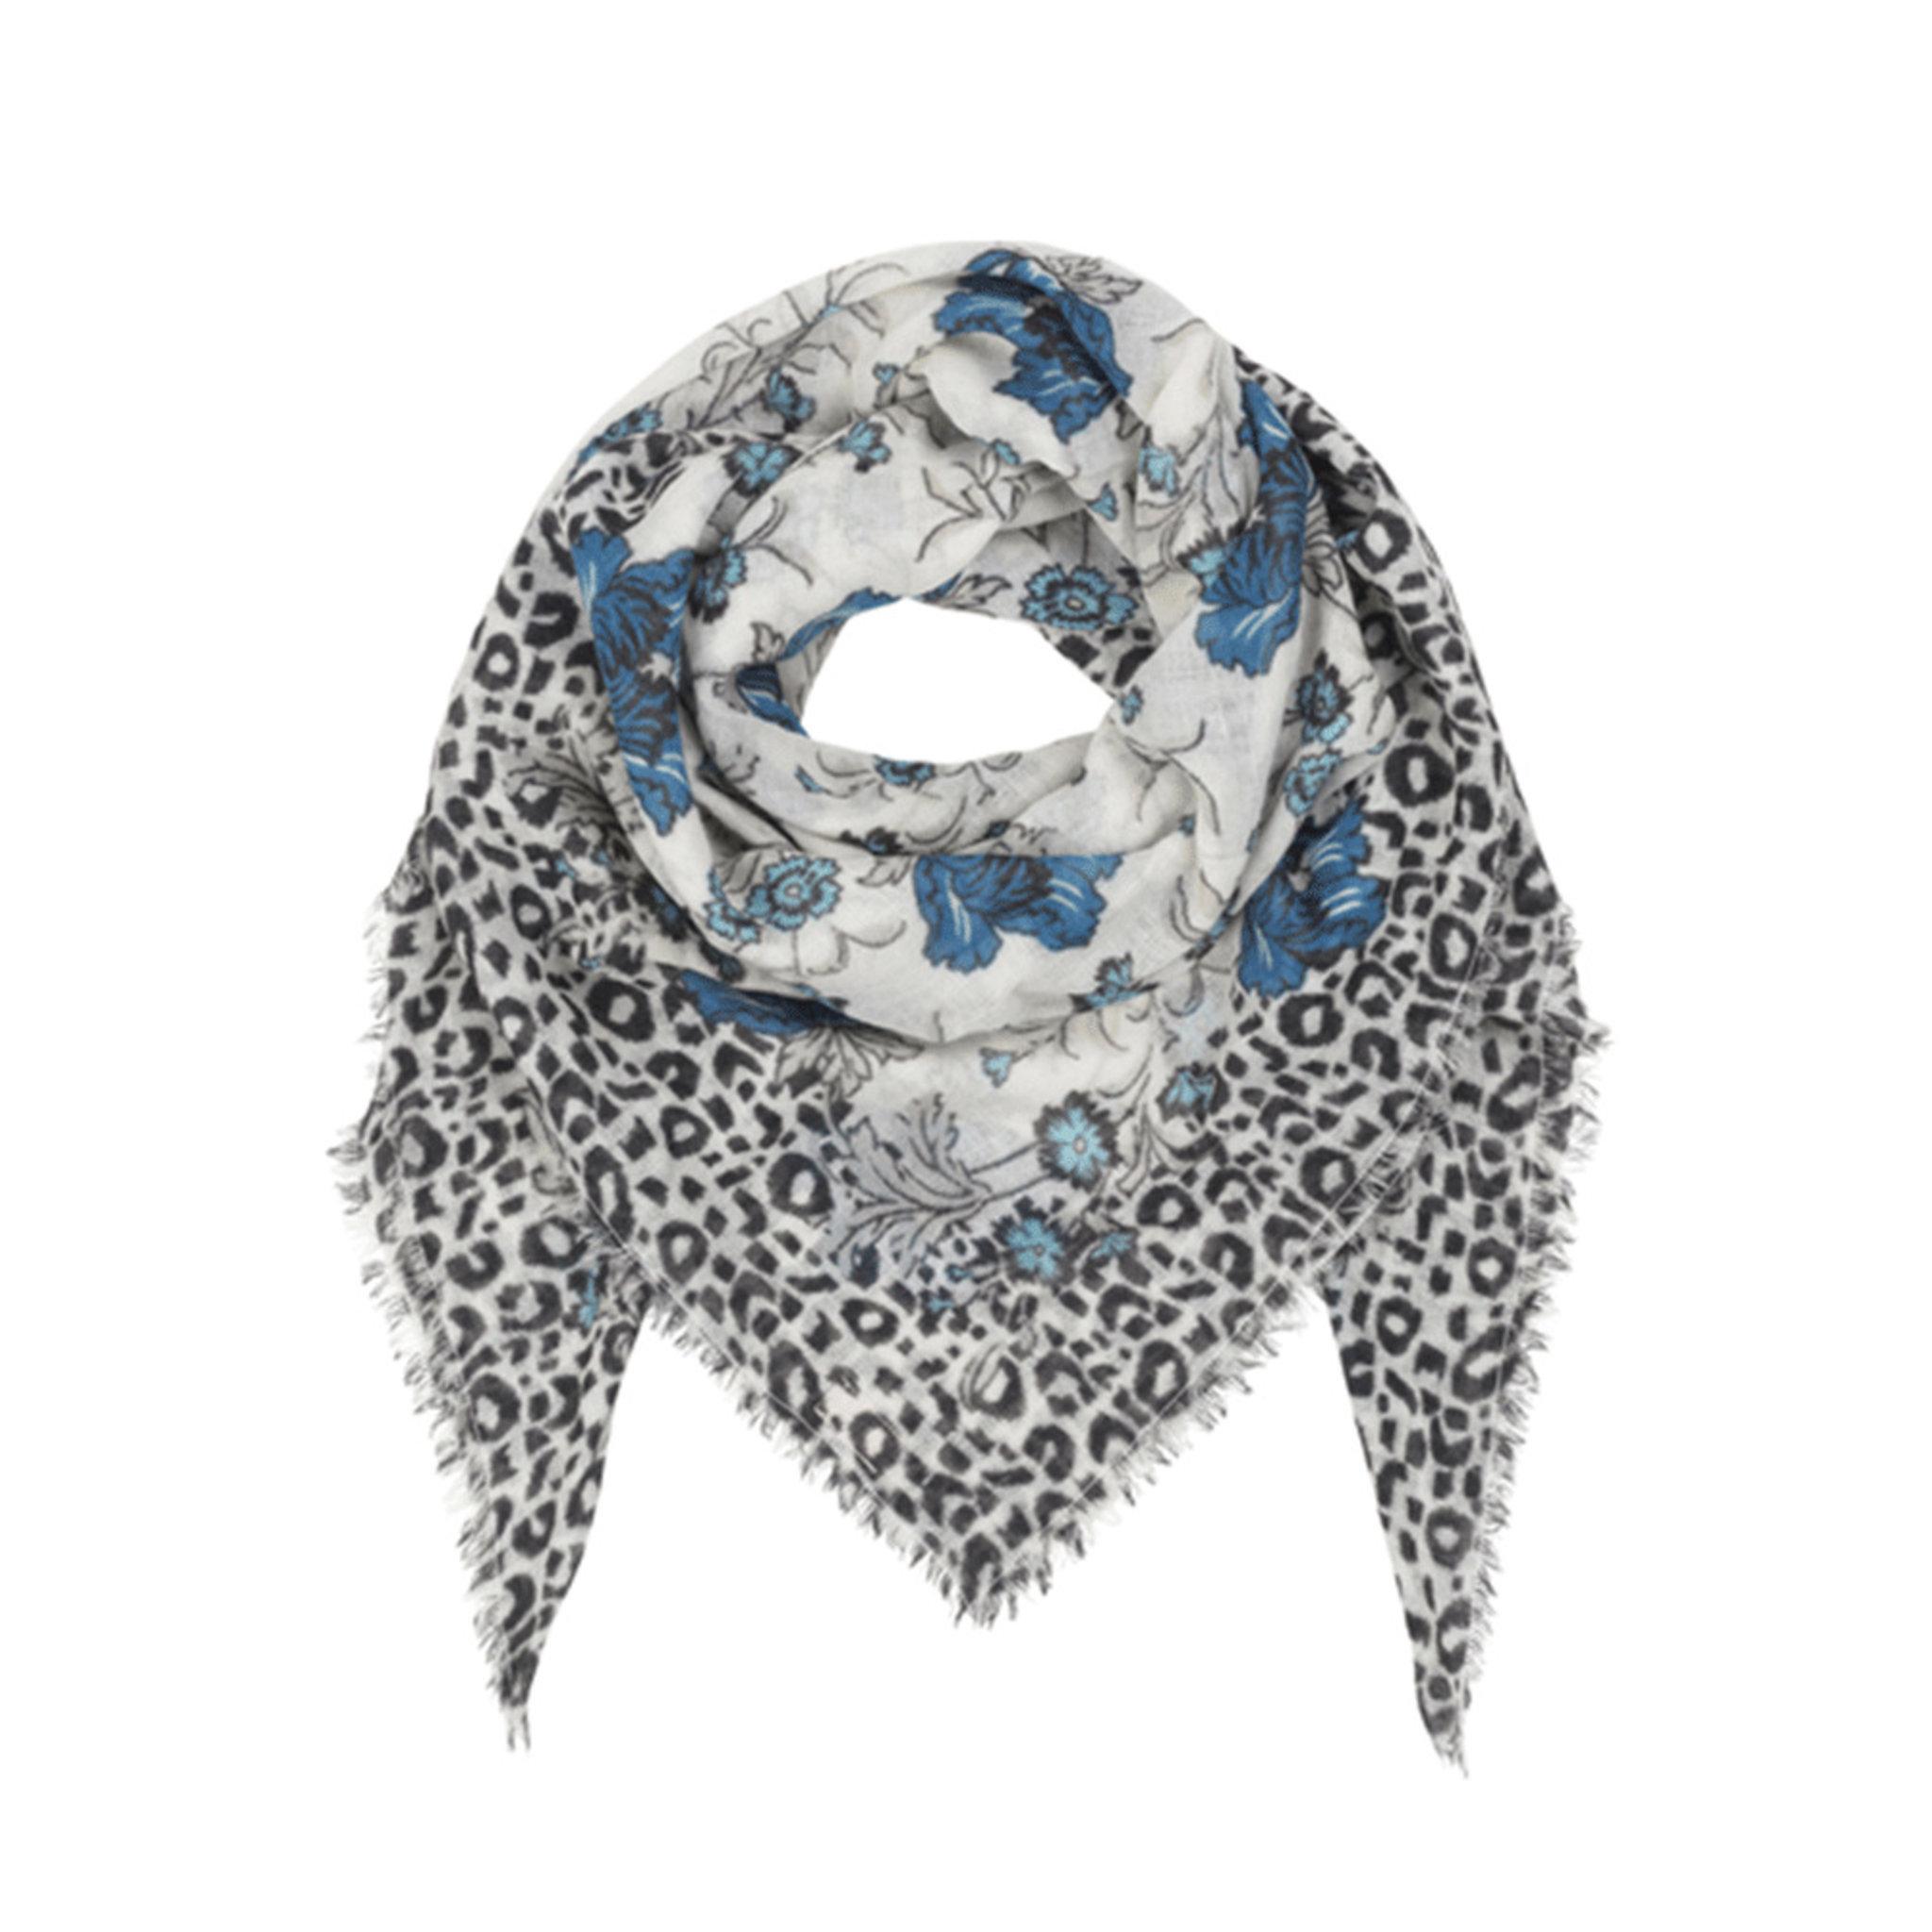 Scarf Edith - Halsdukar   scarves - Köp online på åhlens.se! 130adadc0be6f